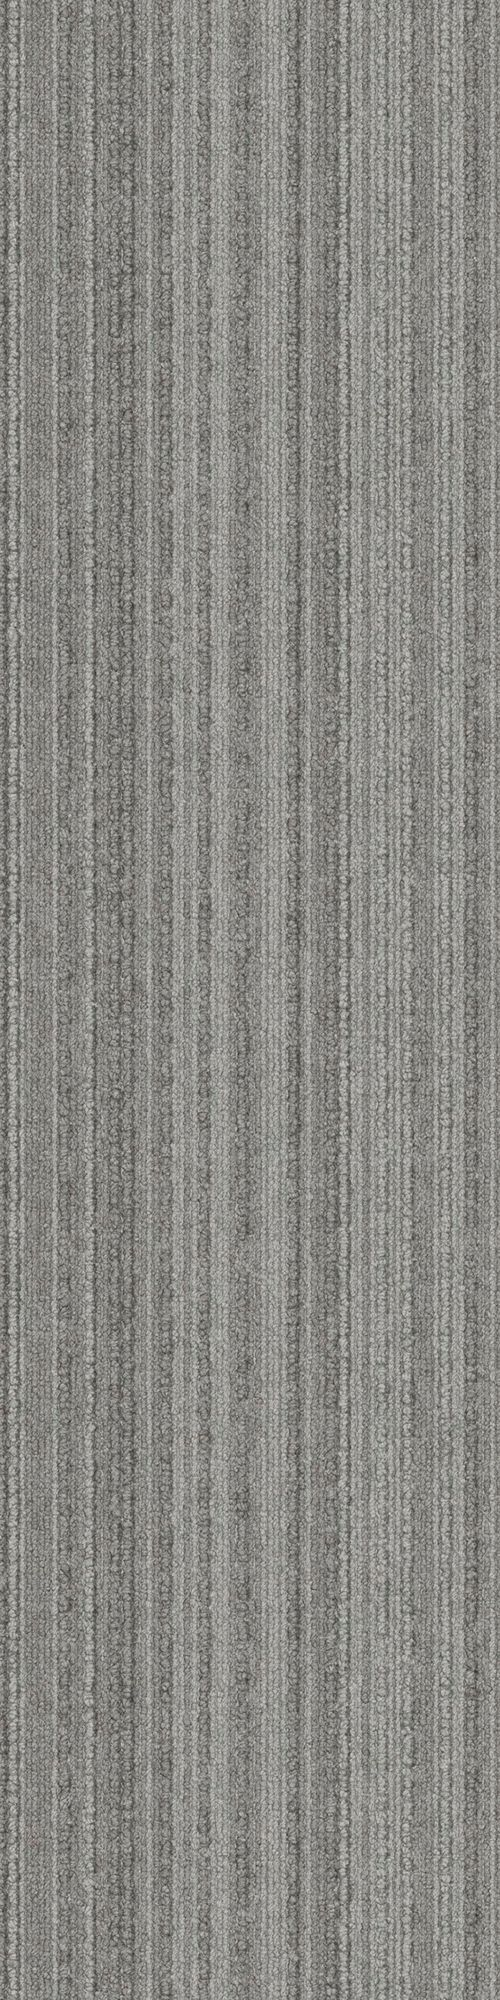 Interface carpet tile: SL910 Color name: Grey